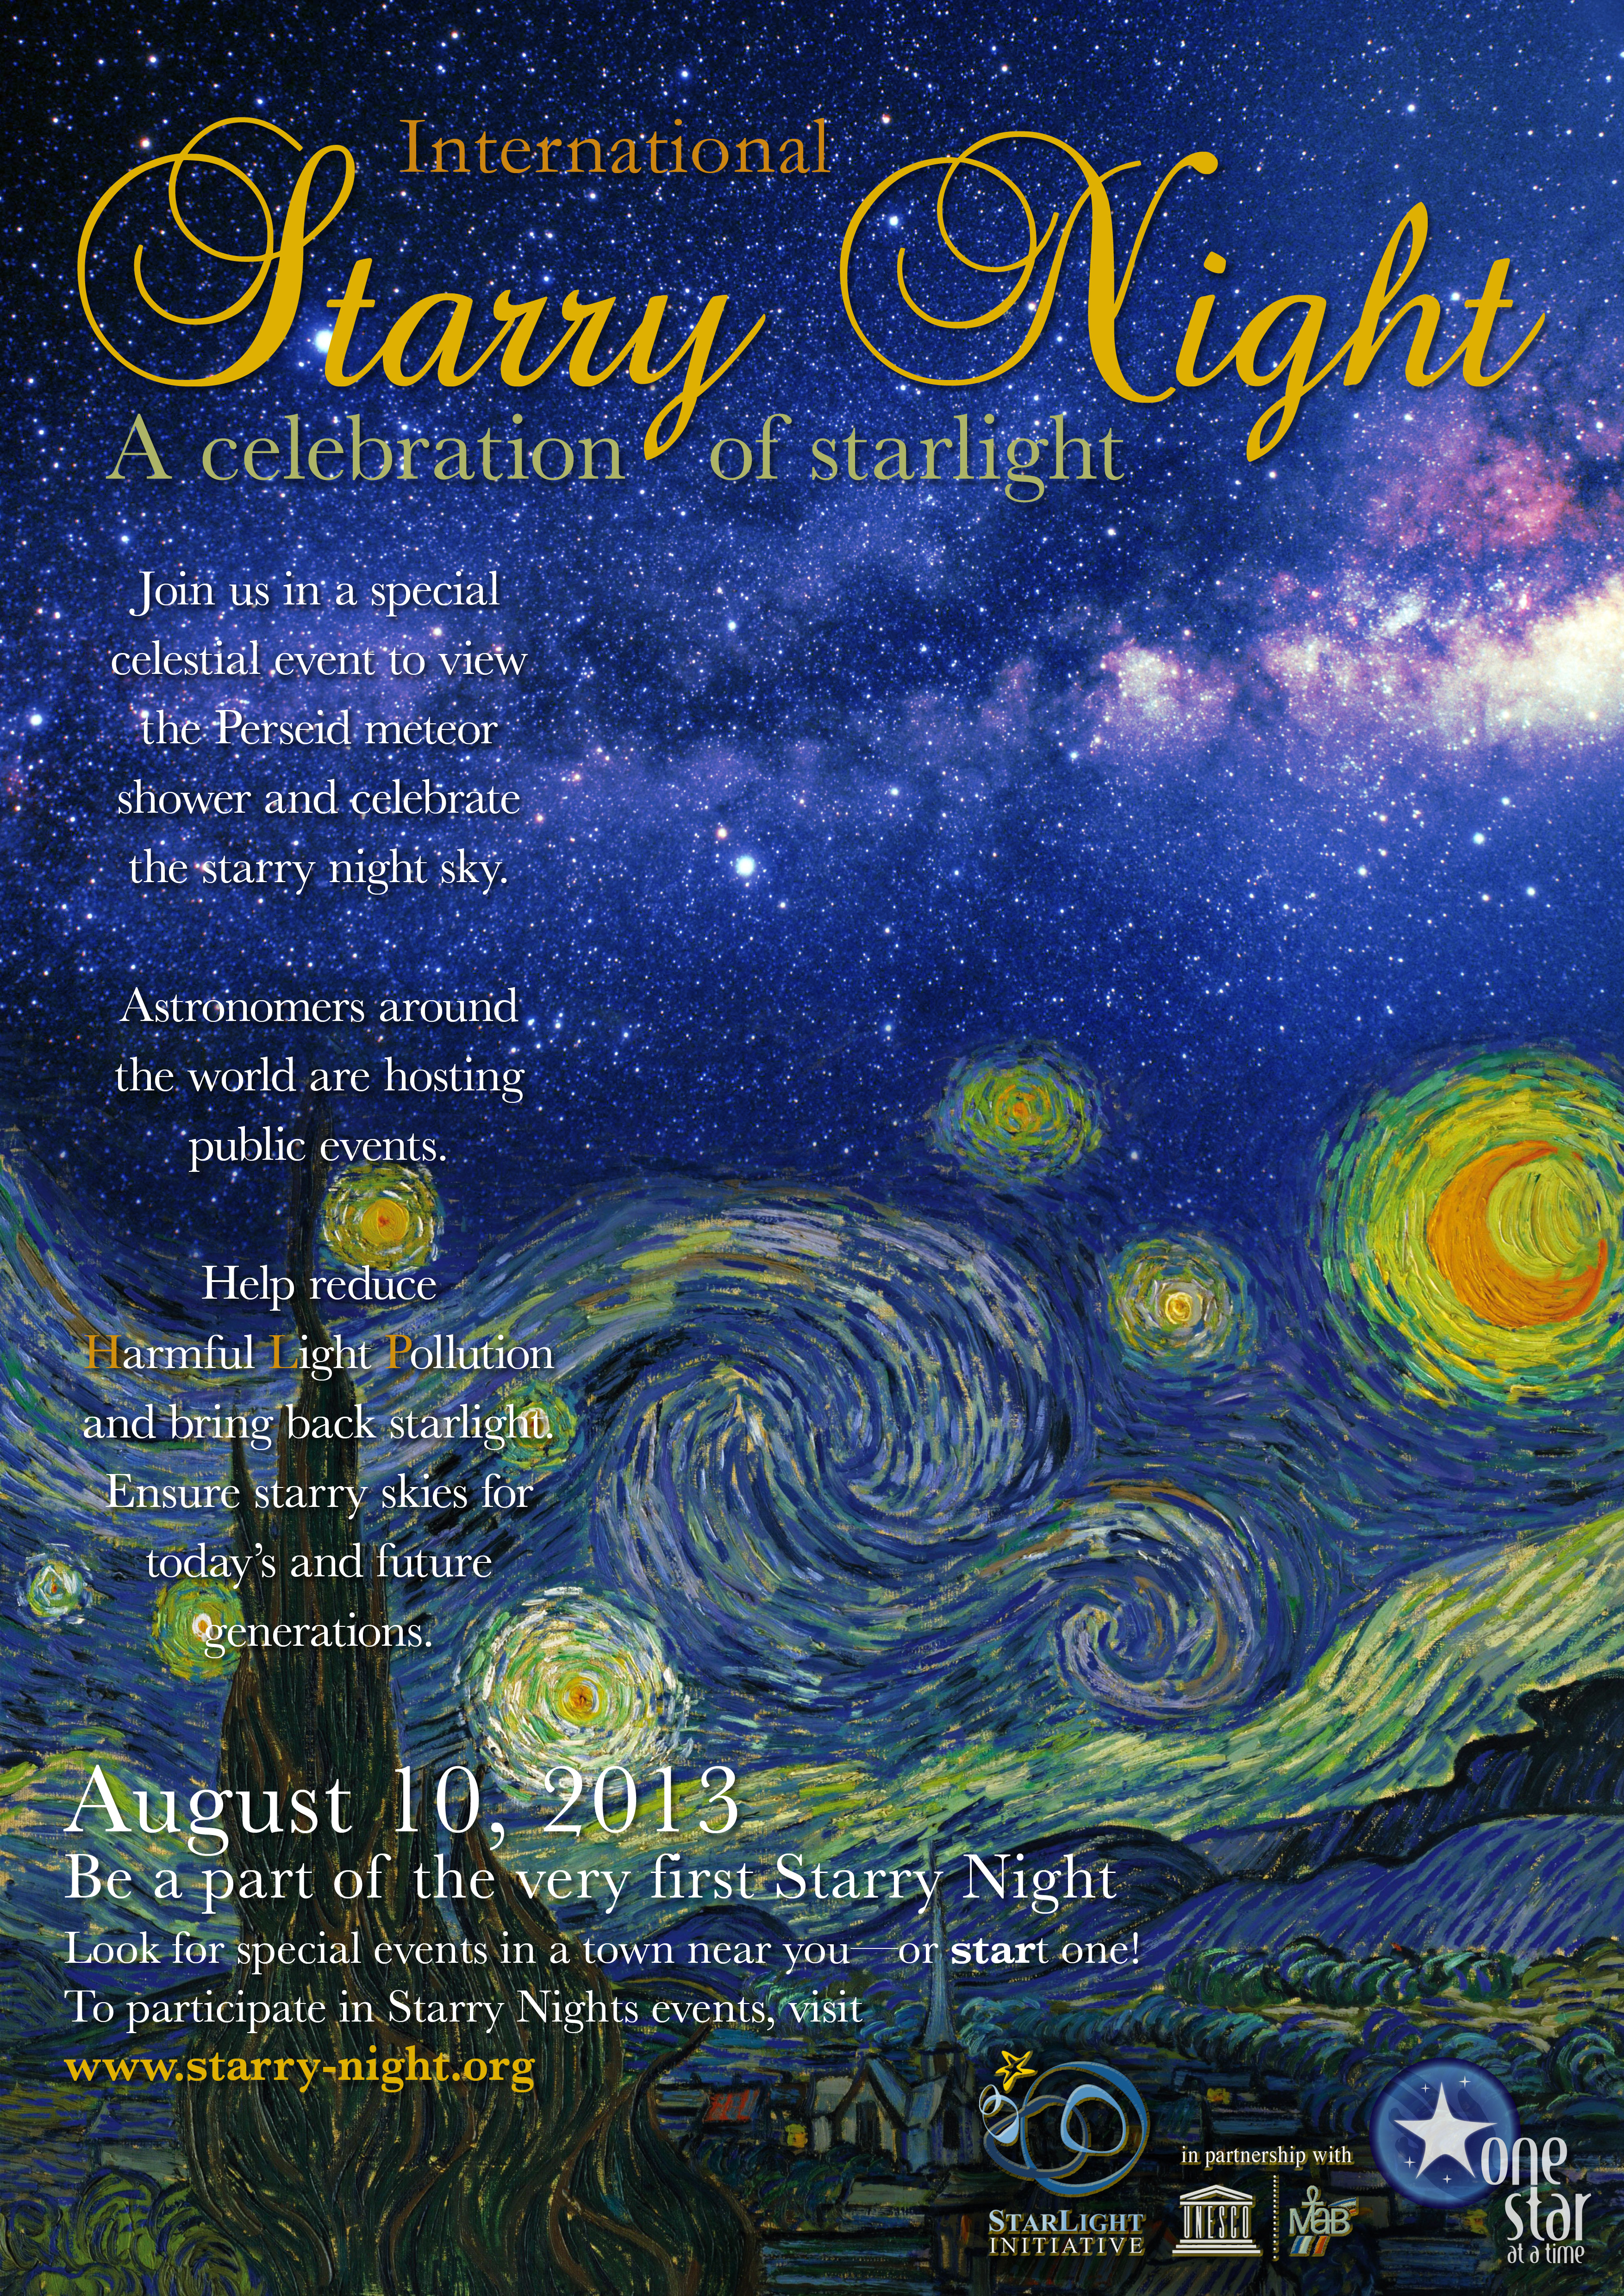 international dark-sky association | CNY Observers & Observing